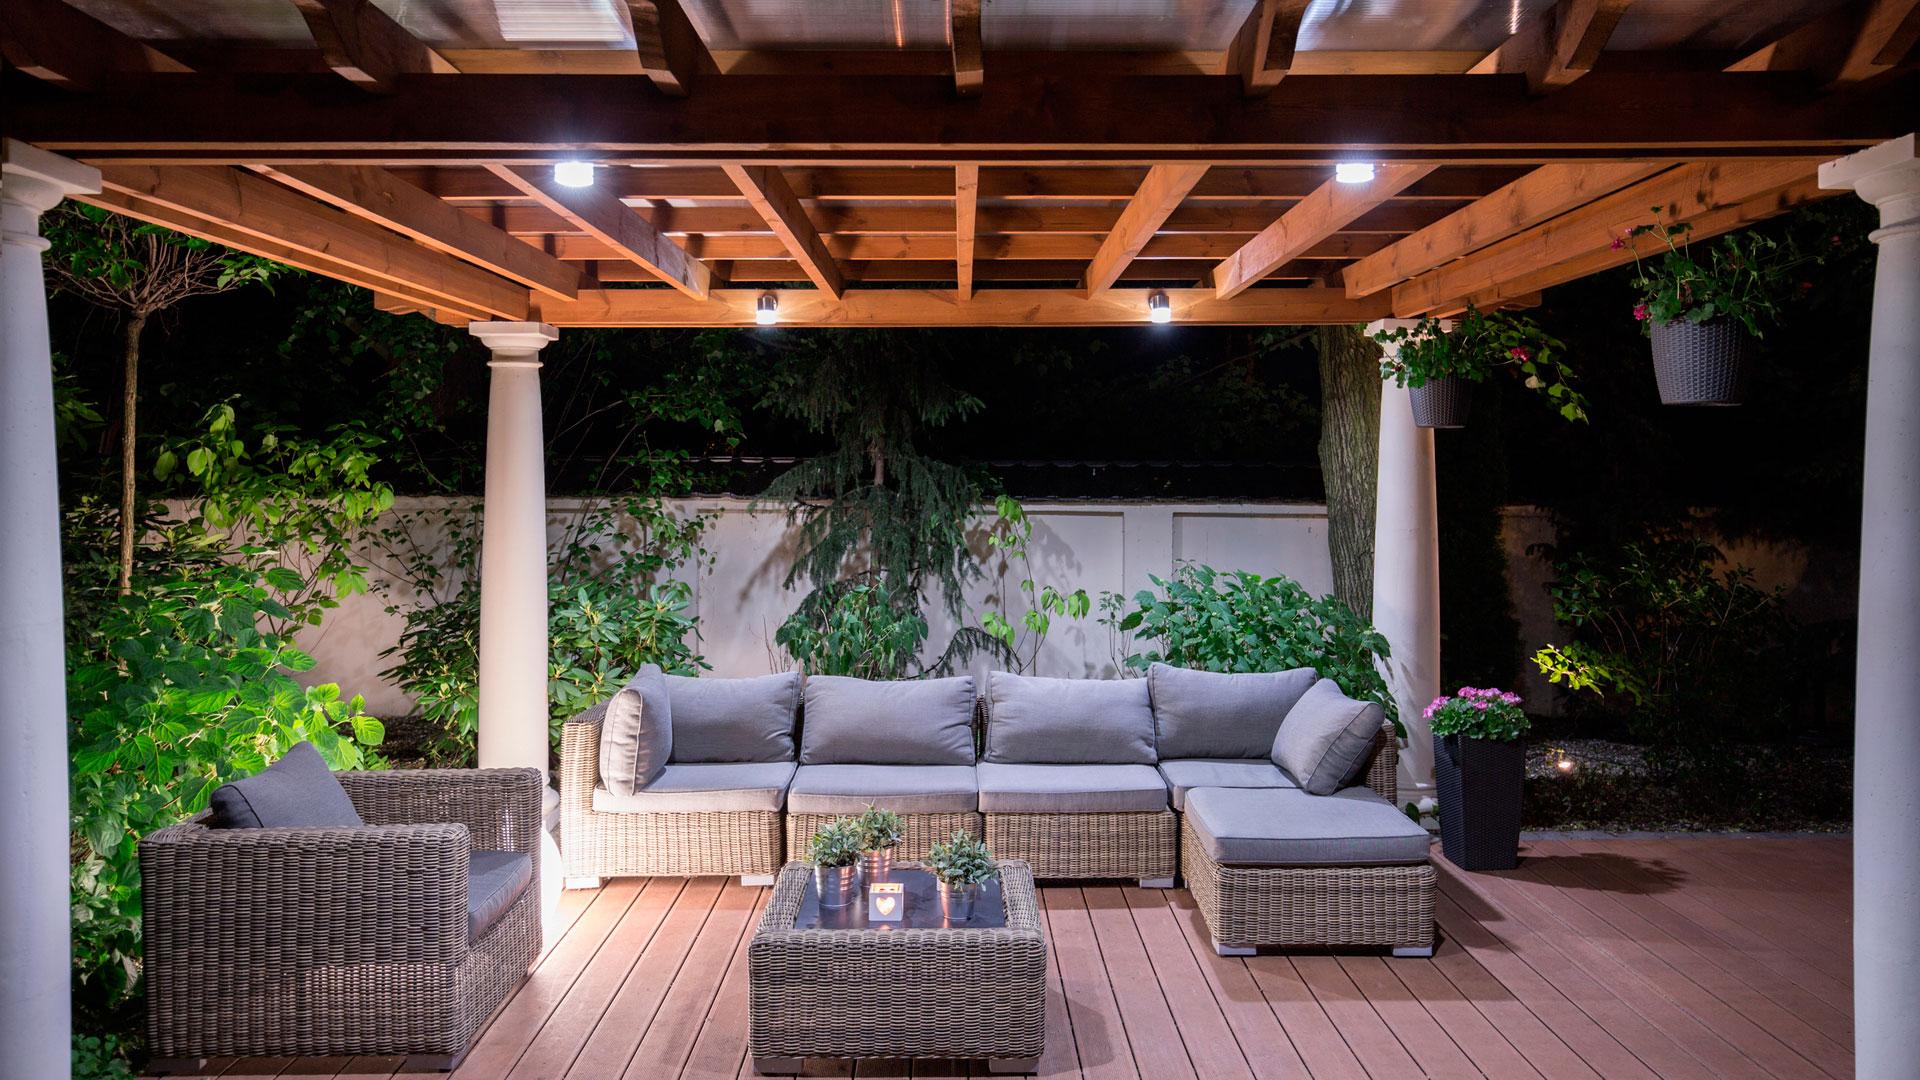 Gazebi da giardino in legno e ferro battuto ville casali for Gazebo arredo giardino